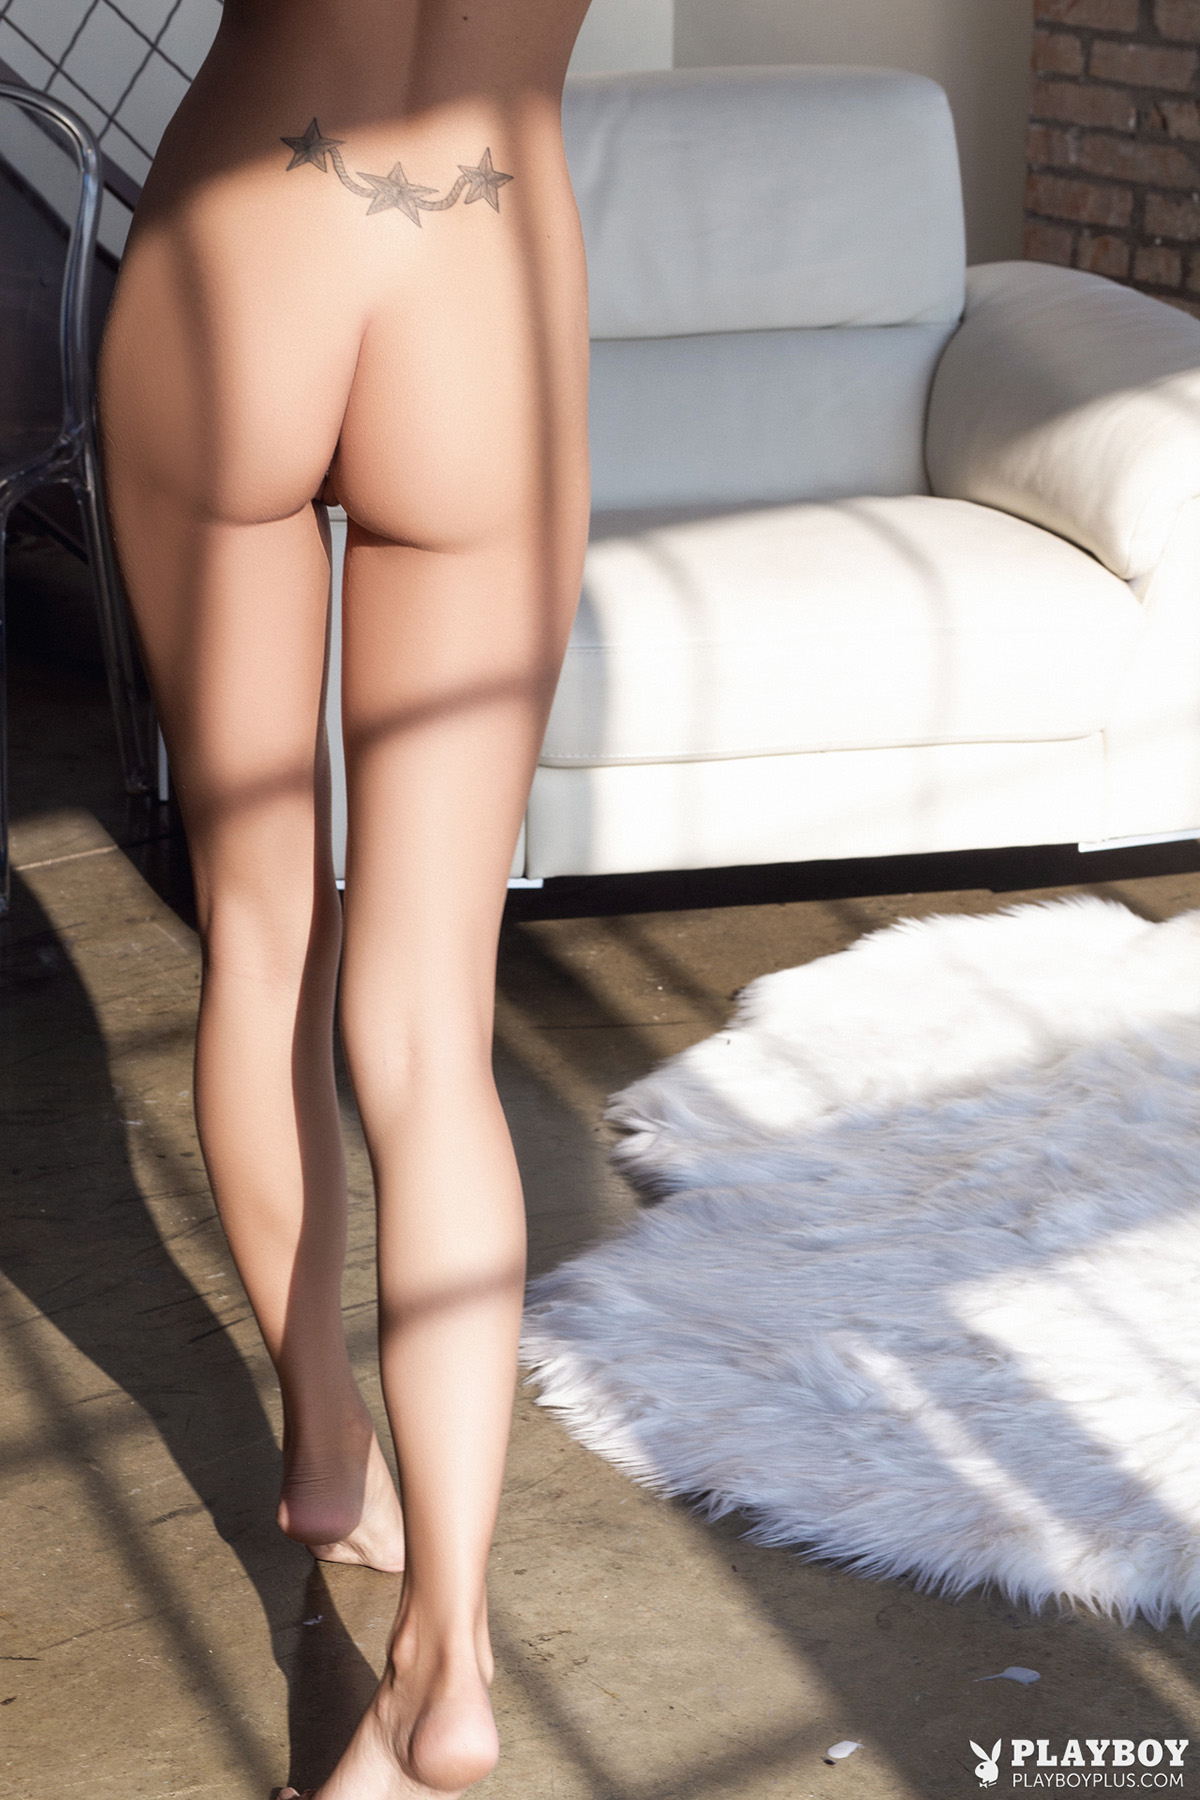 alissa arden via playboy - picture 14 - exgirlfriend market - the